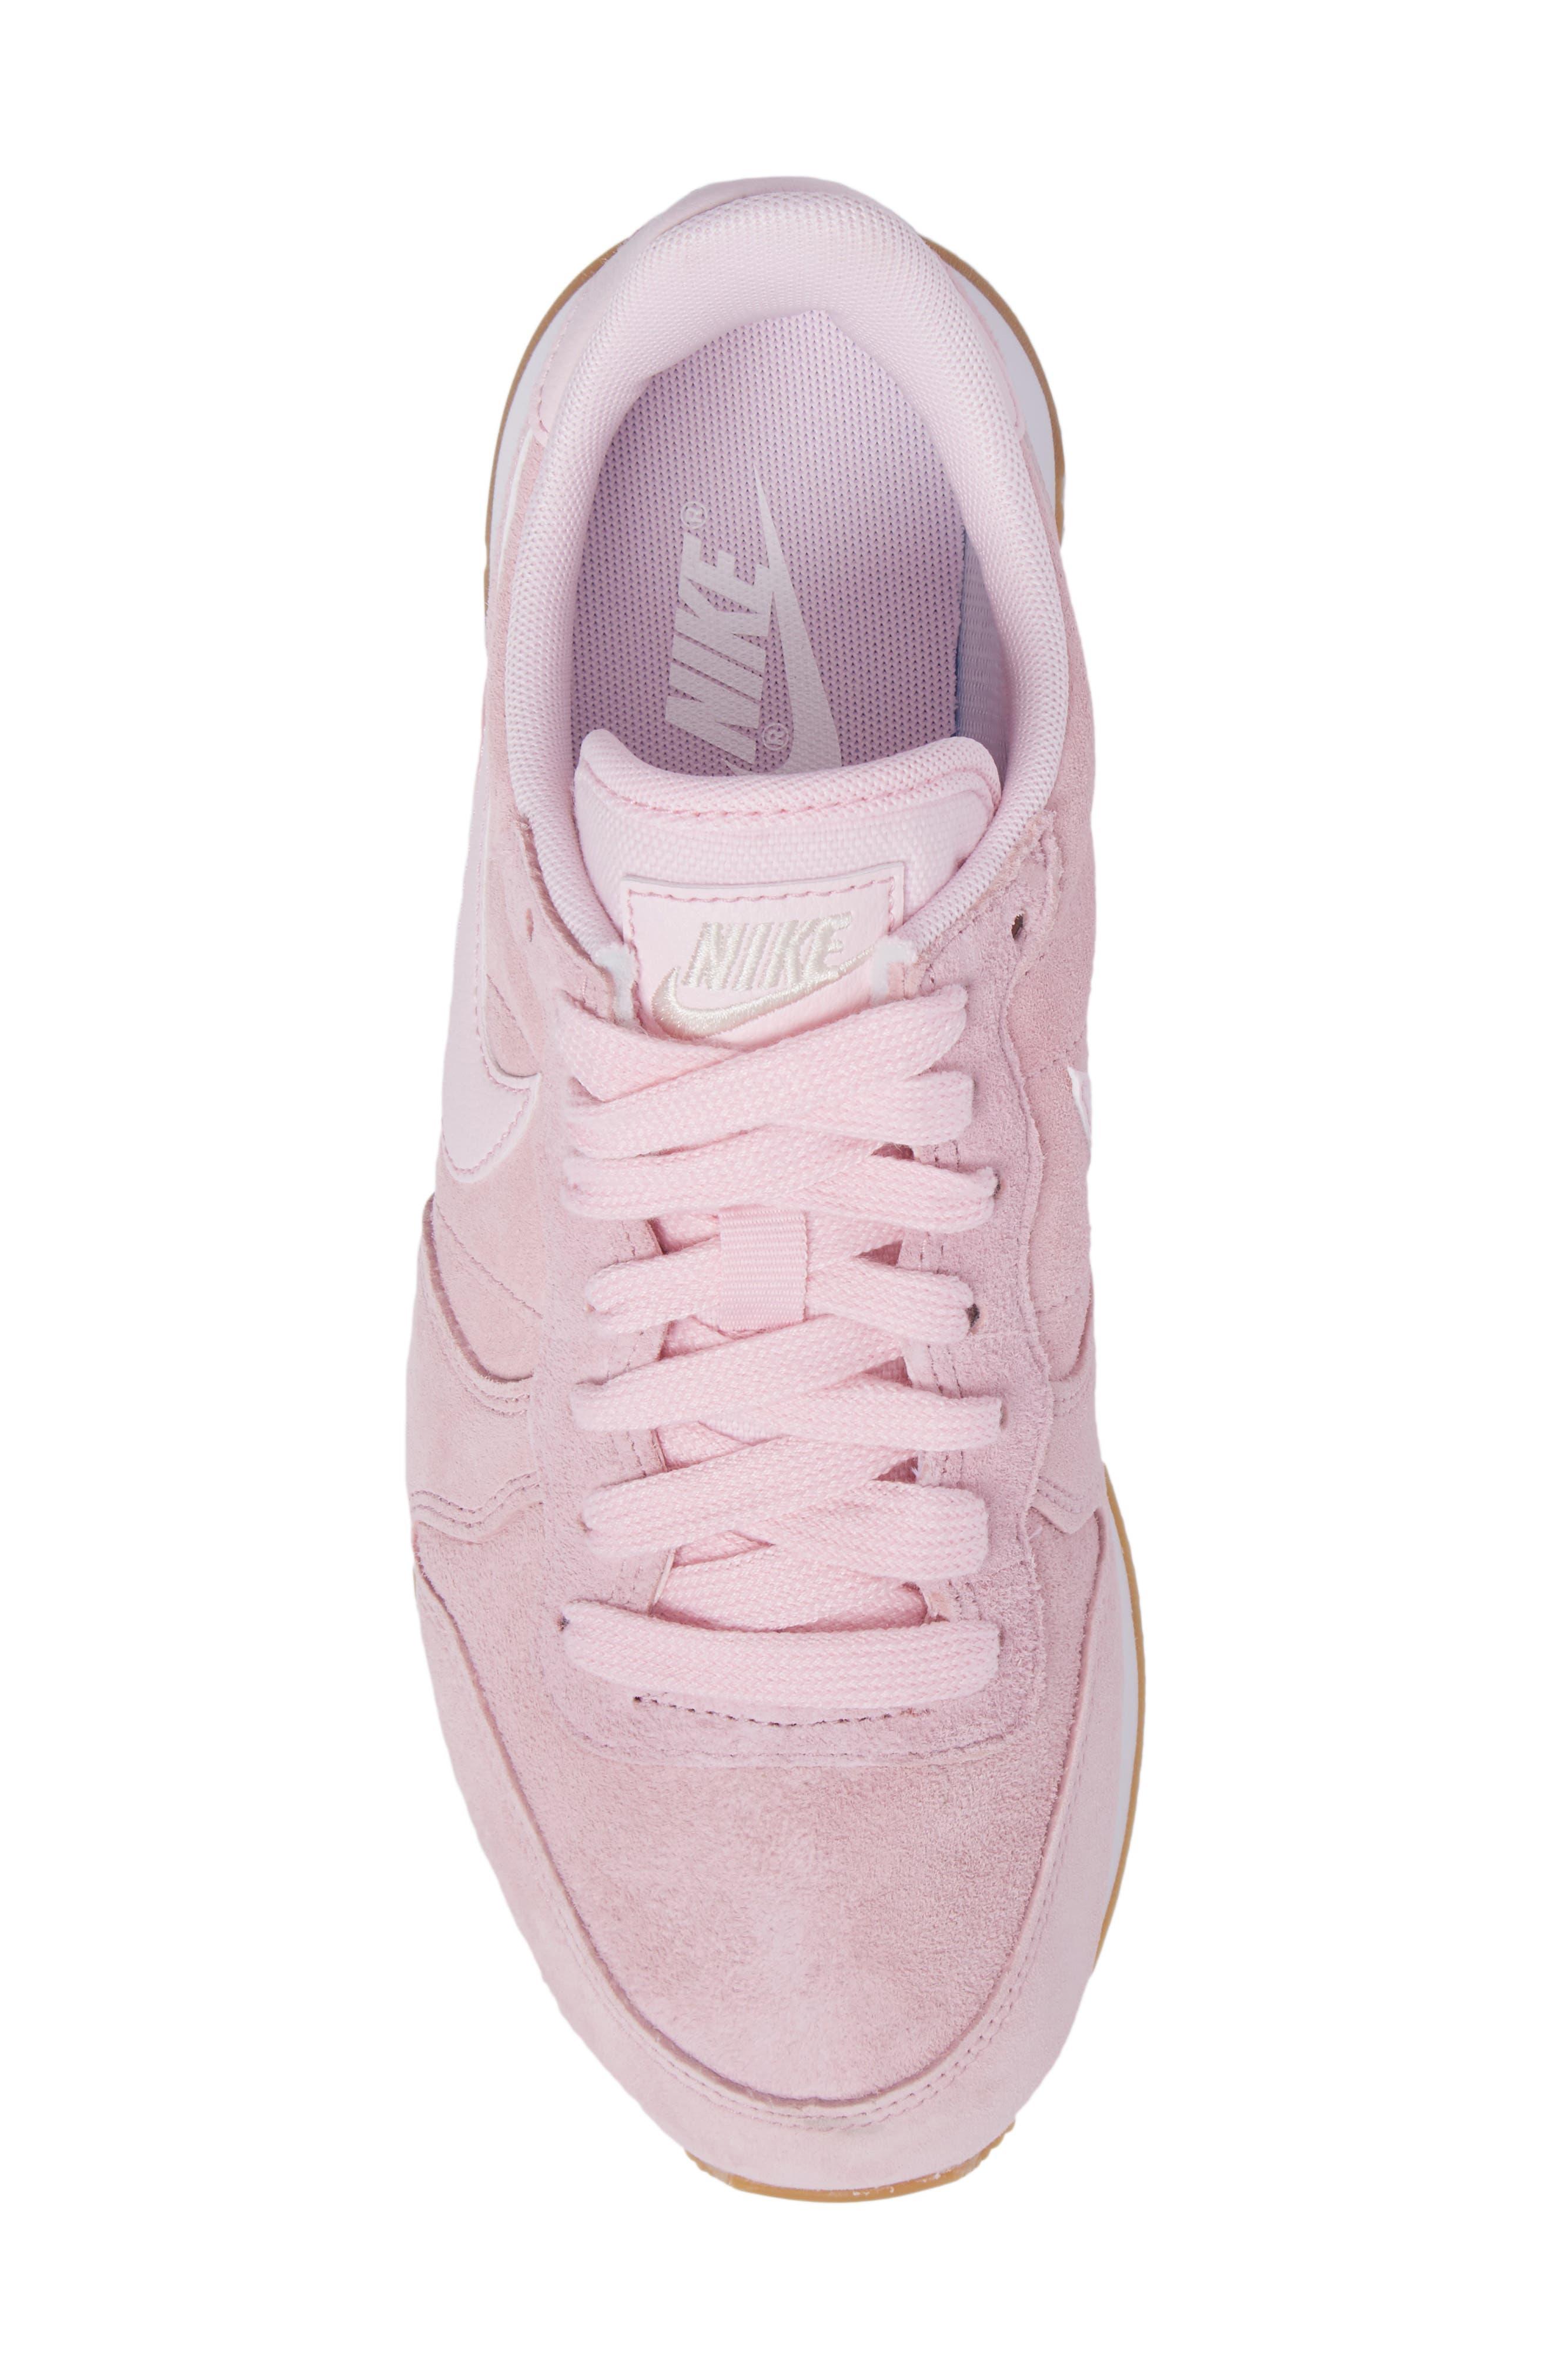 Internationalist SD Sneaker,                             Alternate thumbnail 5, color,                             Prism Pink/ Prism Pink